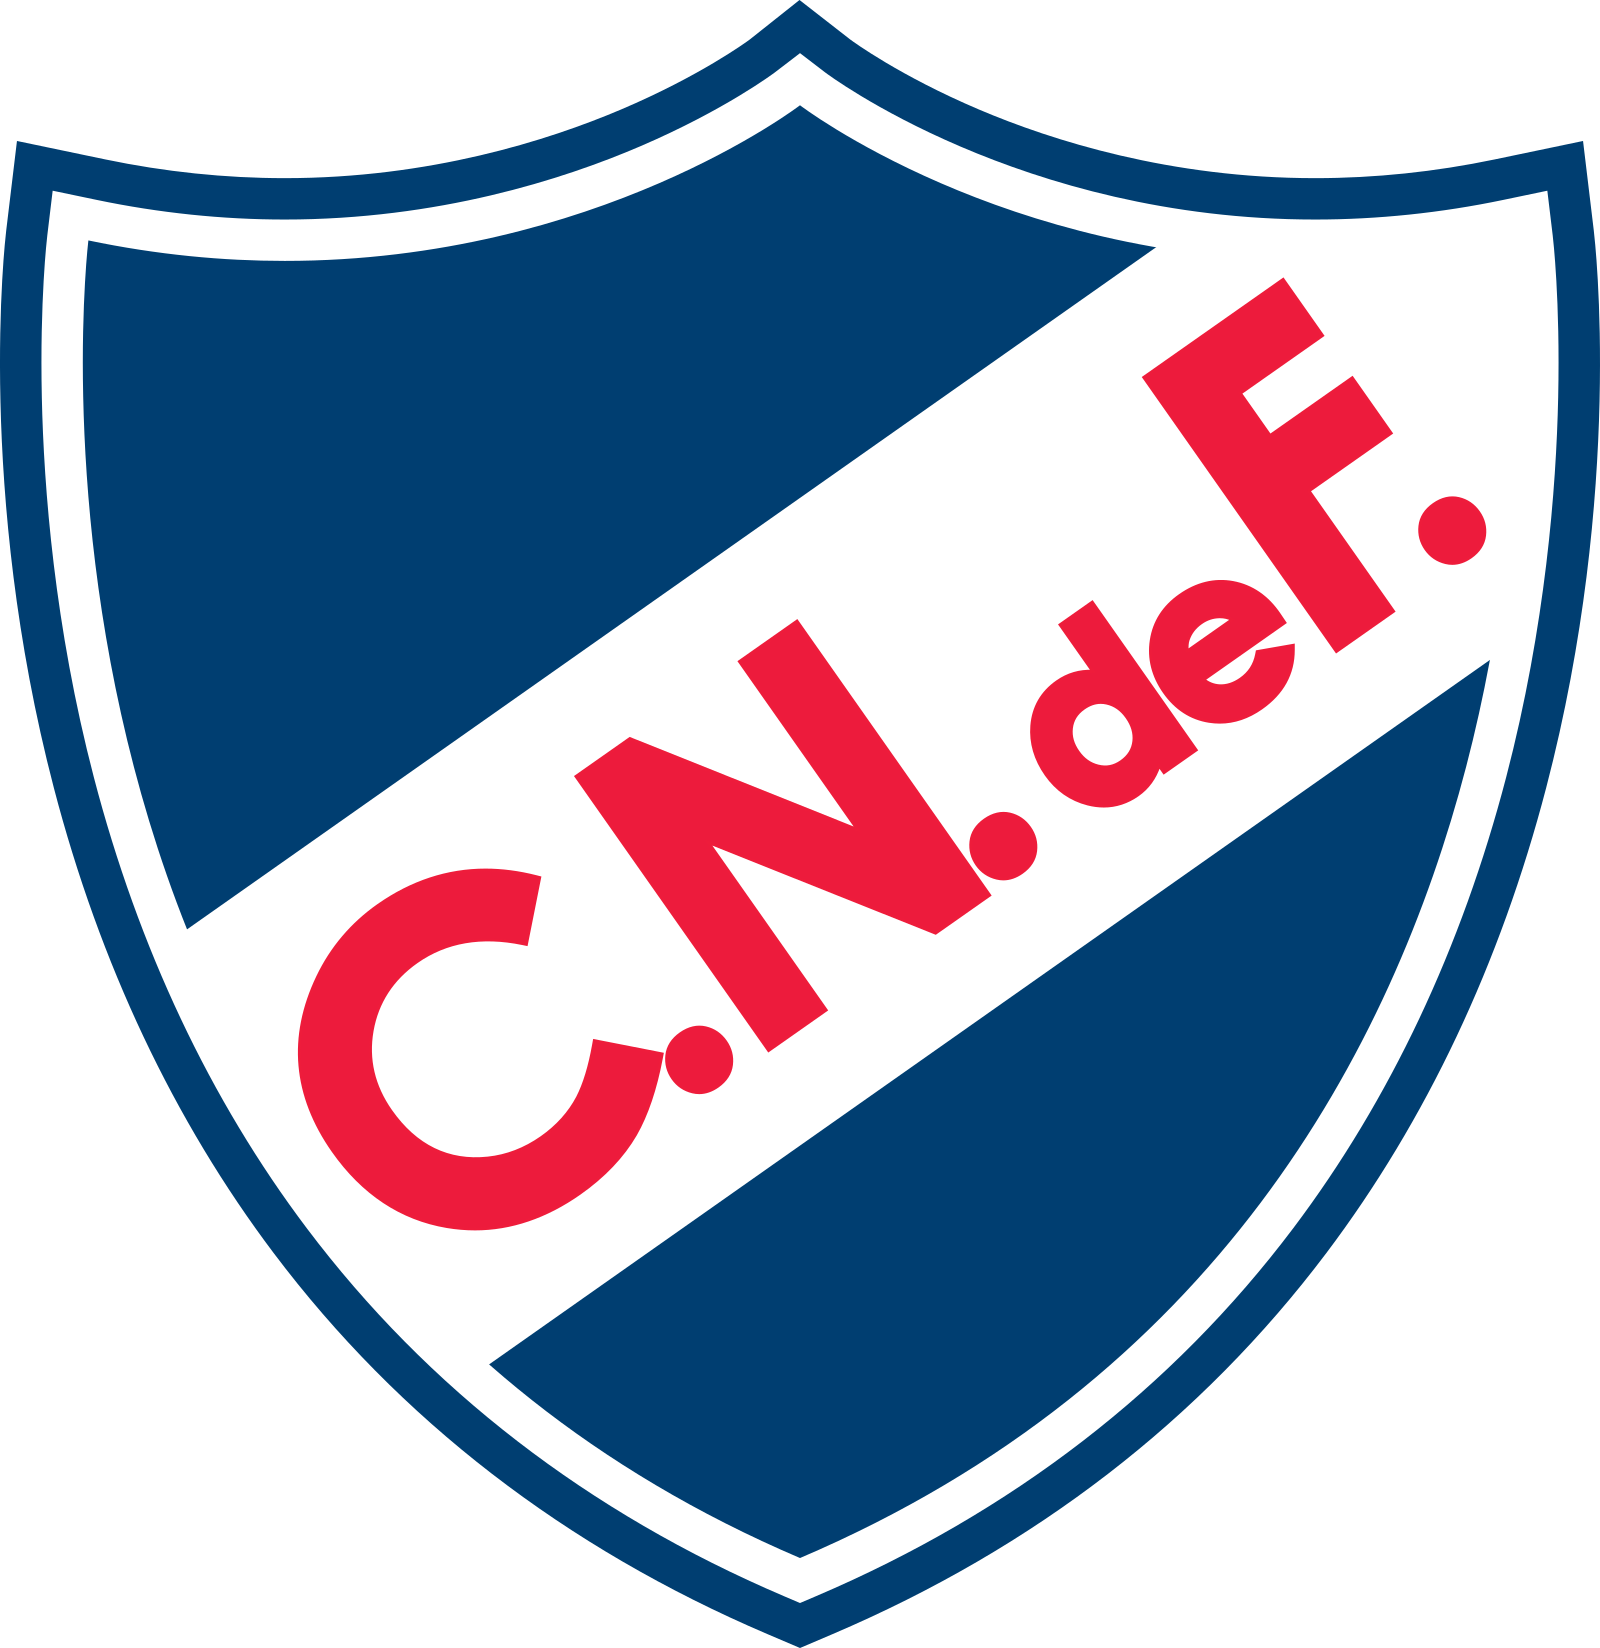 nacional do uruguai logo escudo 2 - Nacional Logo (Uruguay) – Club Nacional de Football Escudo